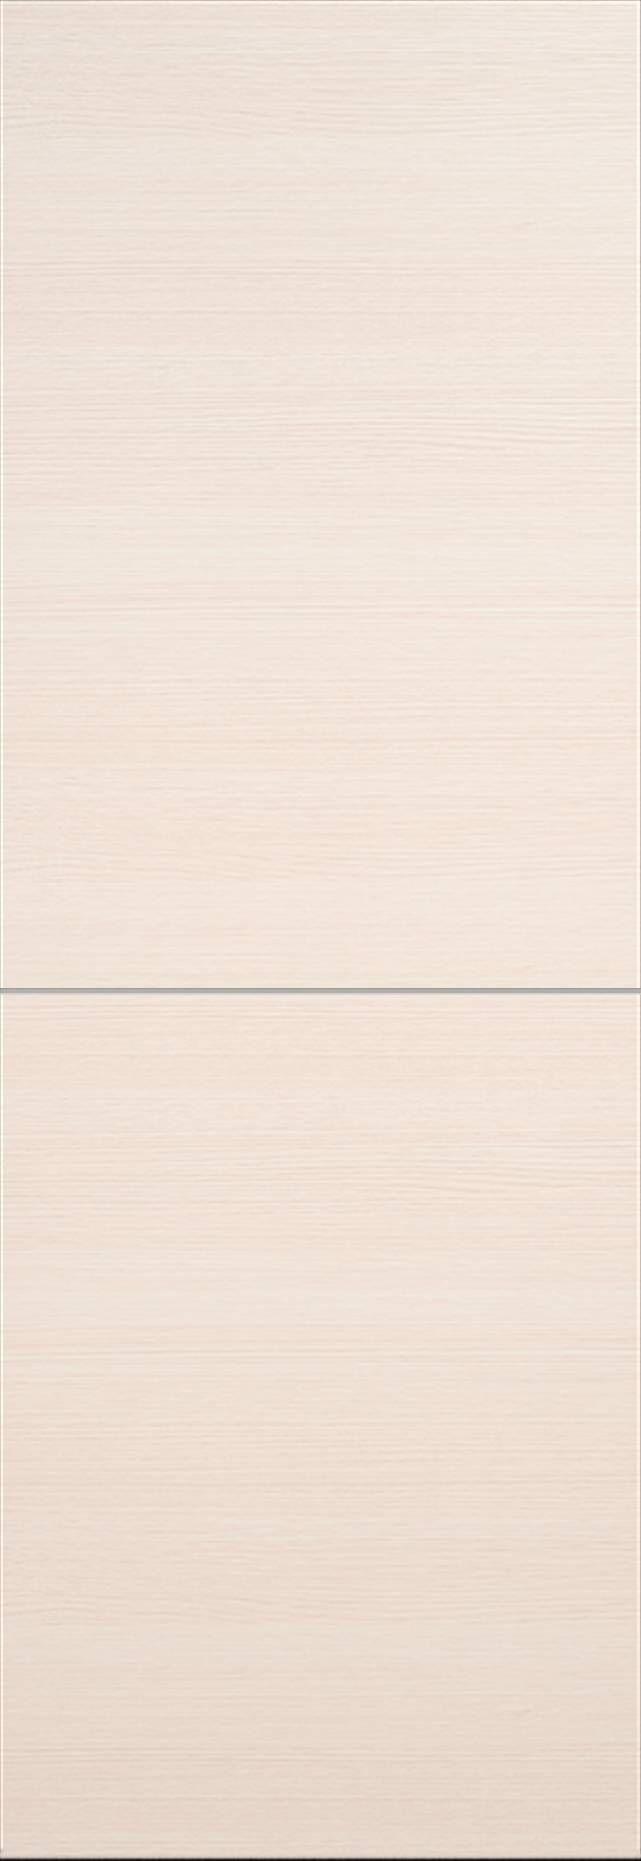 Tivoli Б-2 Invisible цвет - Беленый дуб Без стекла (ДГ)